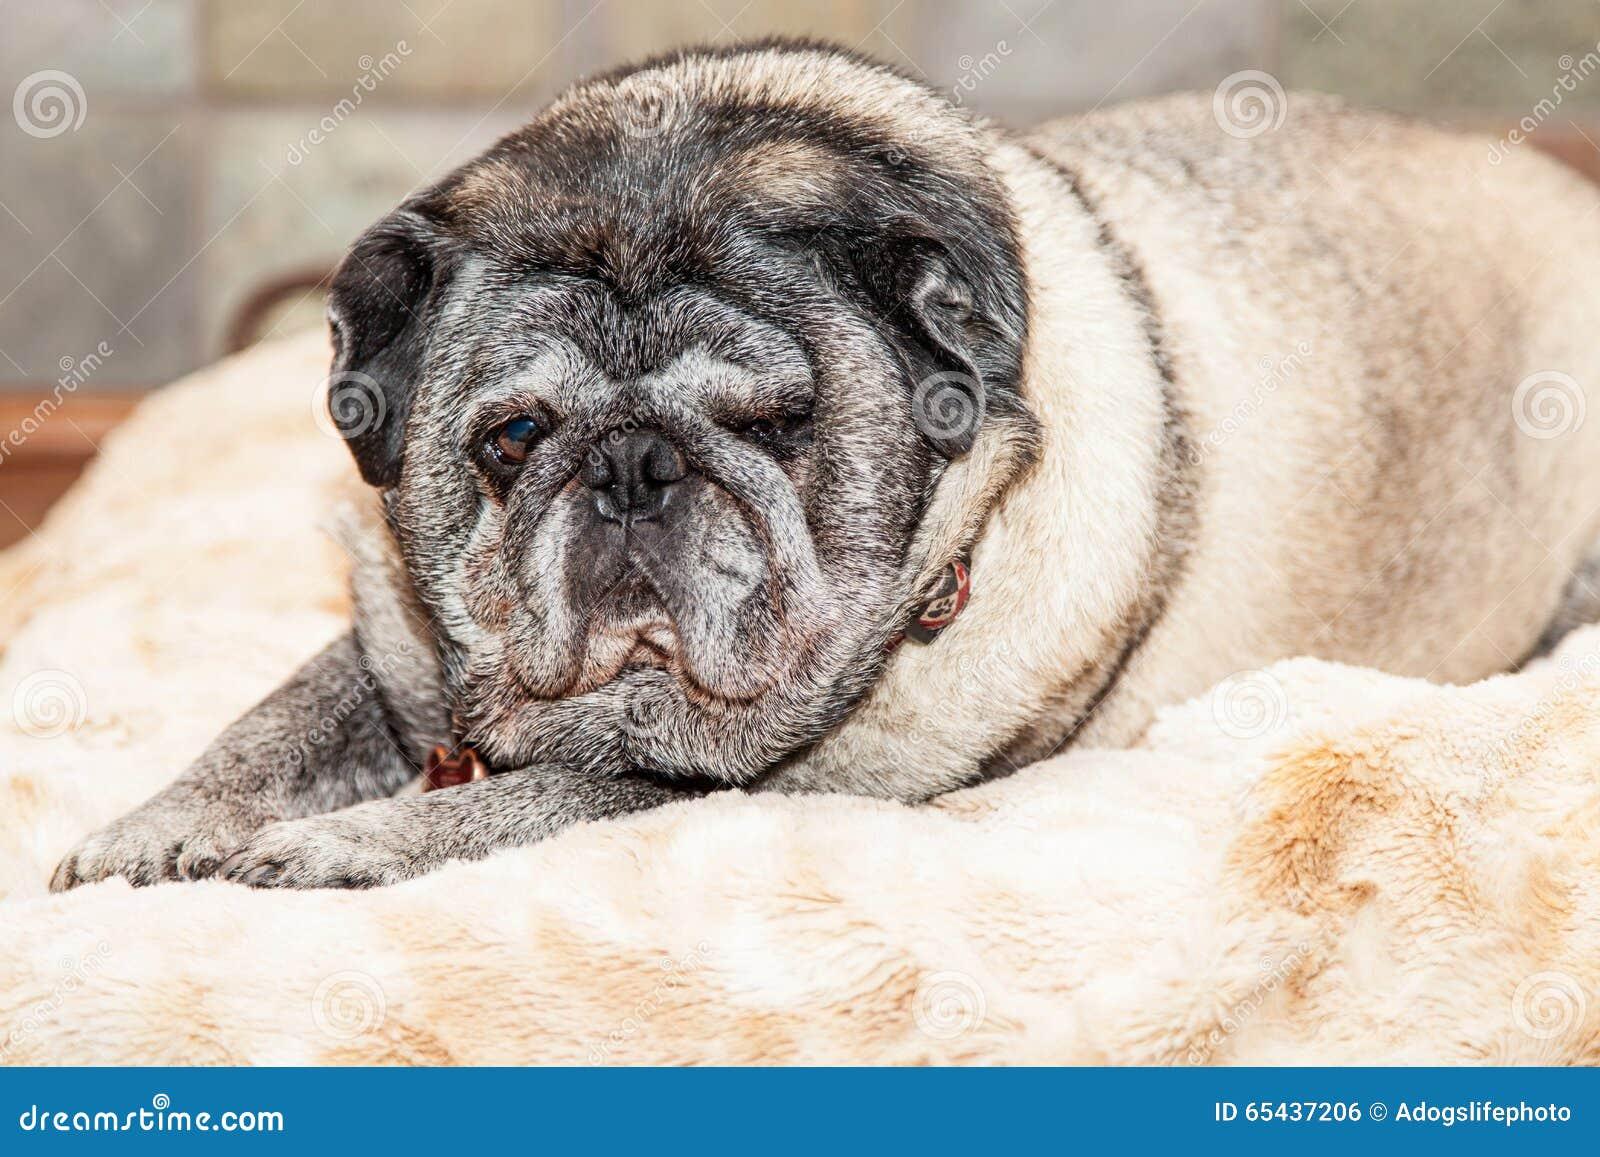 Big Lazy Dog Breeds